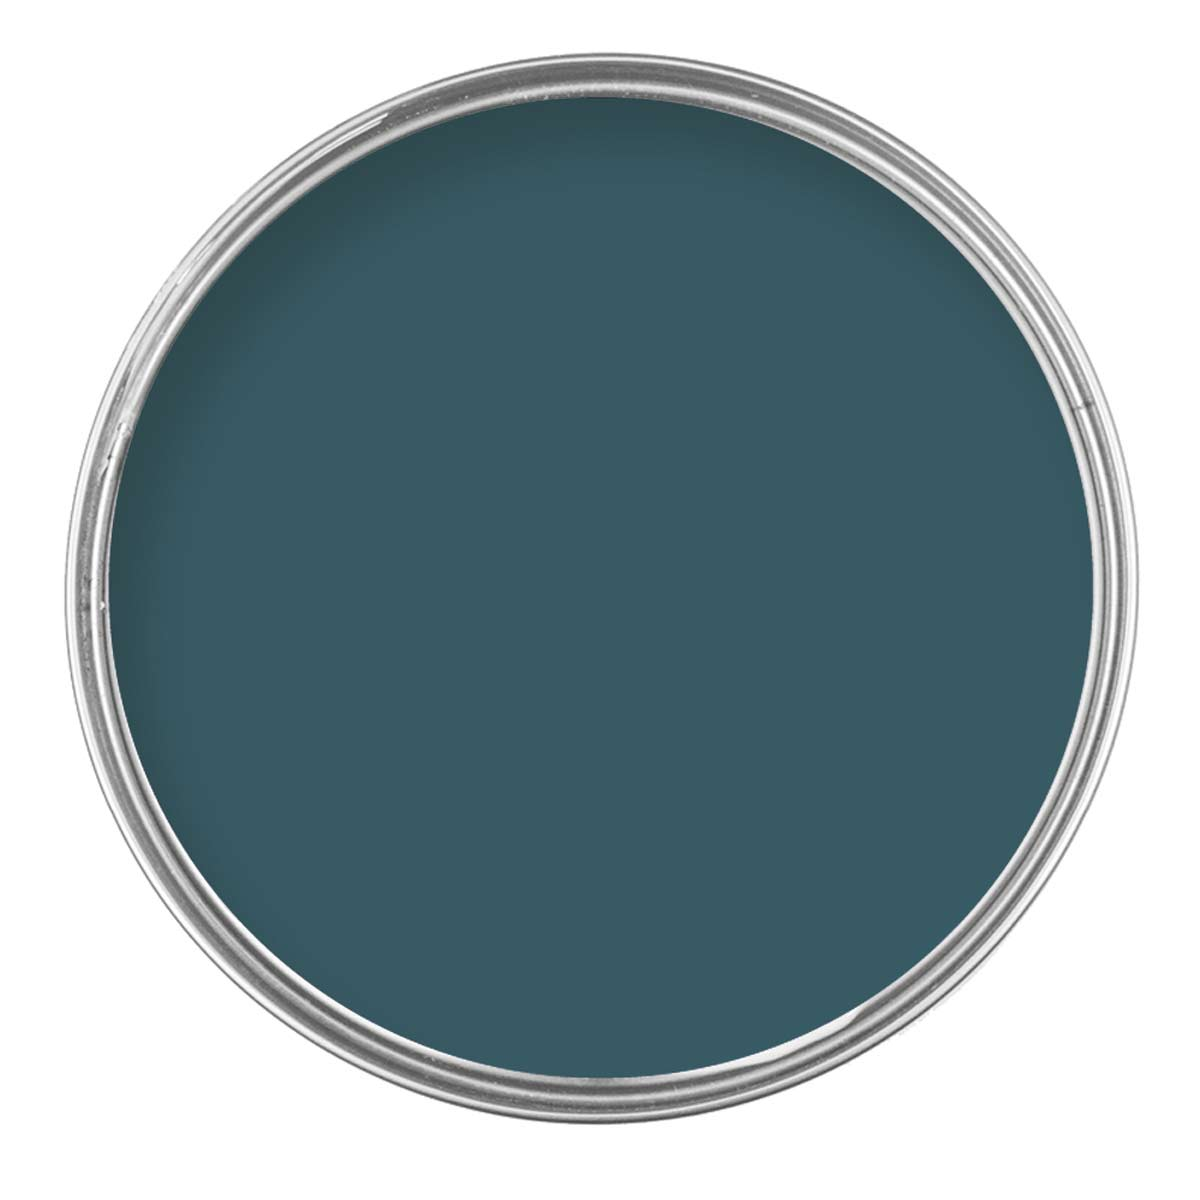 Arthouse 2.5L Chalky Matt Paint - Dusky Teal